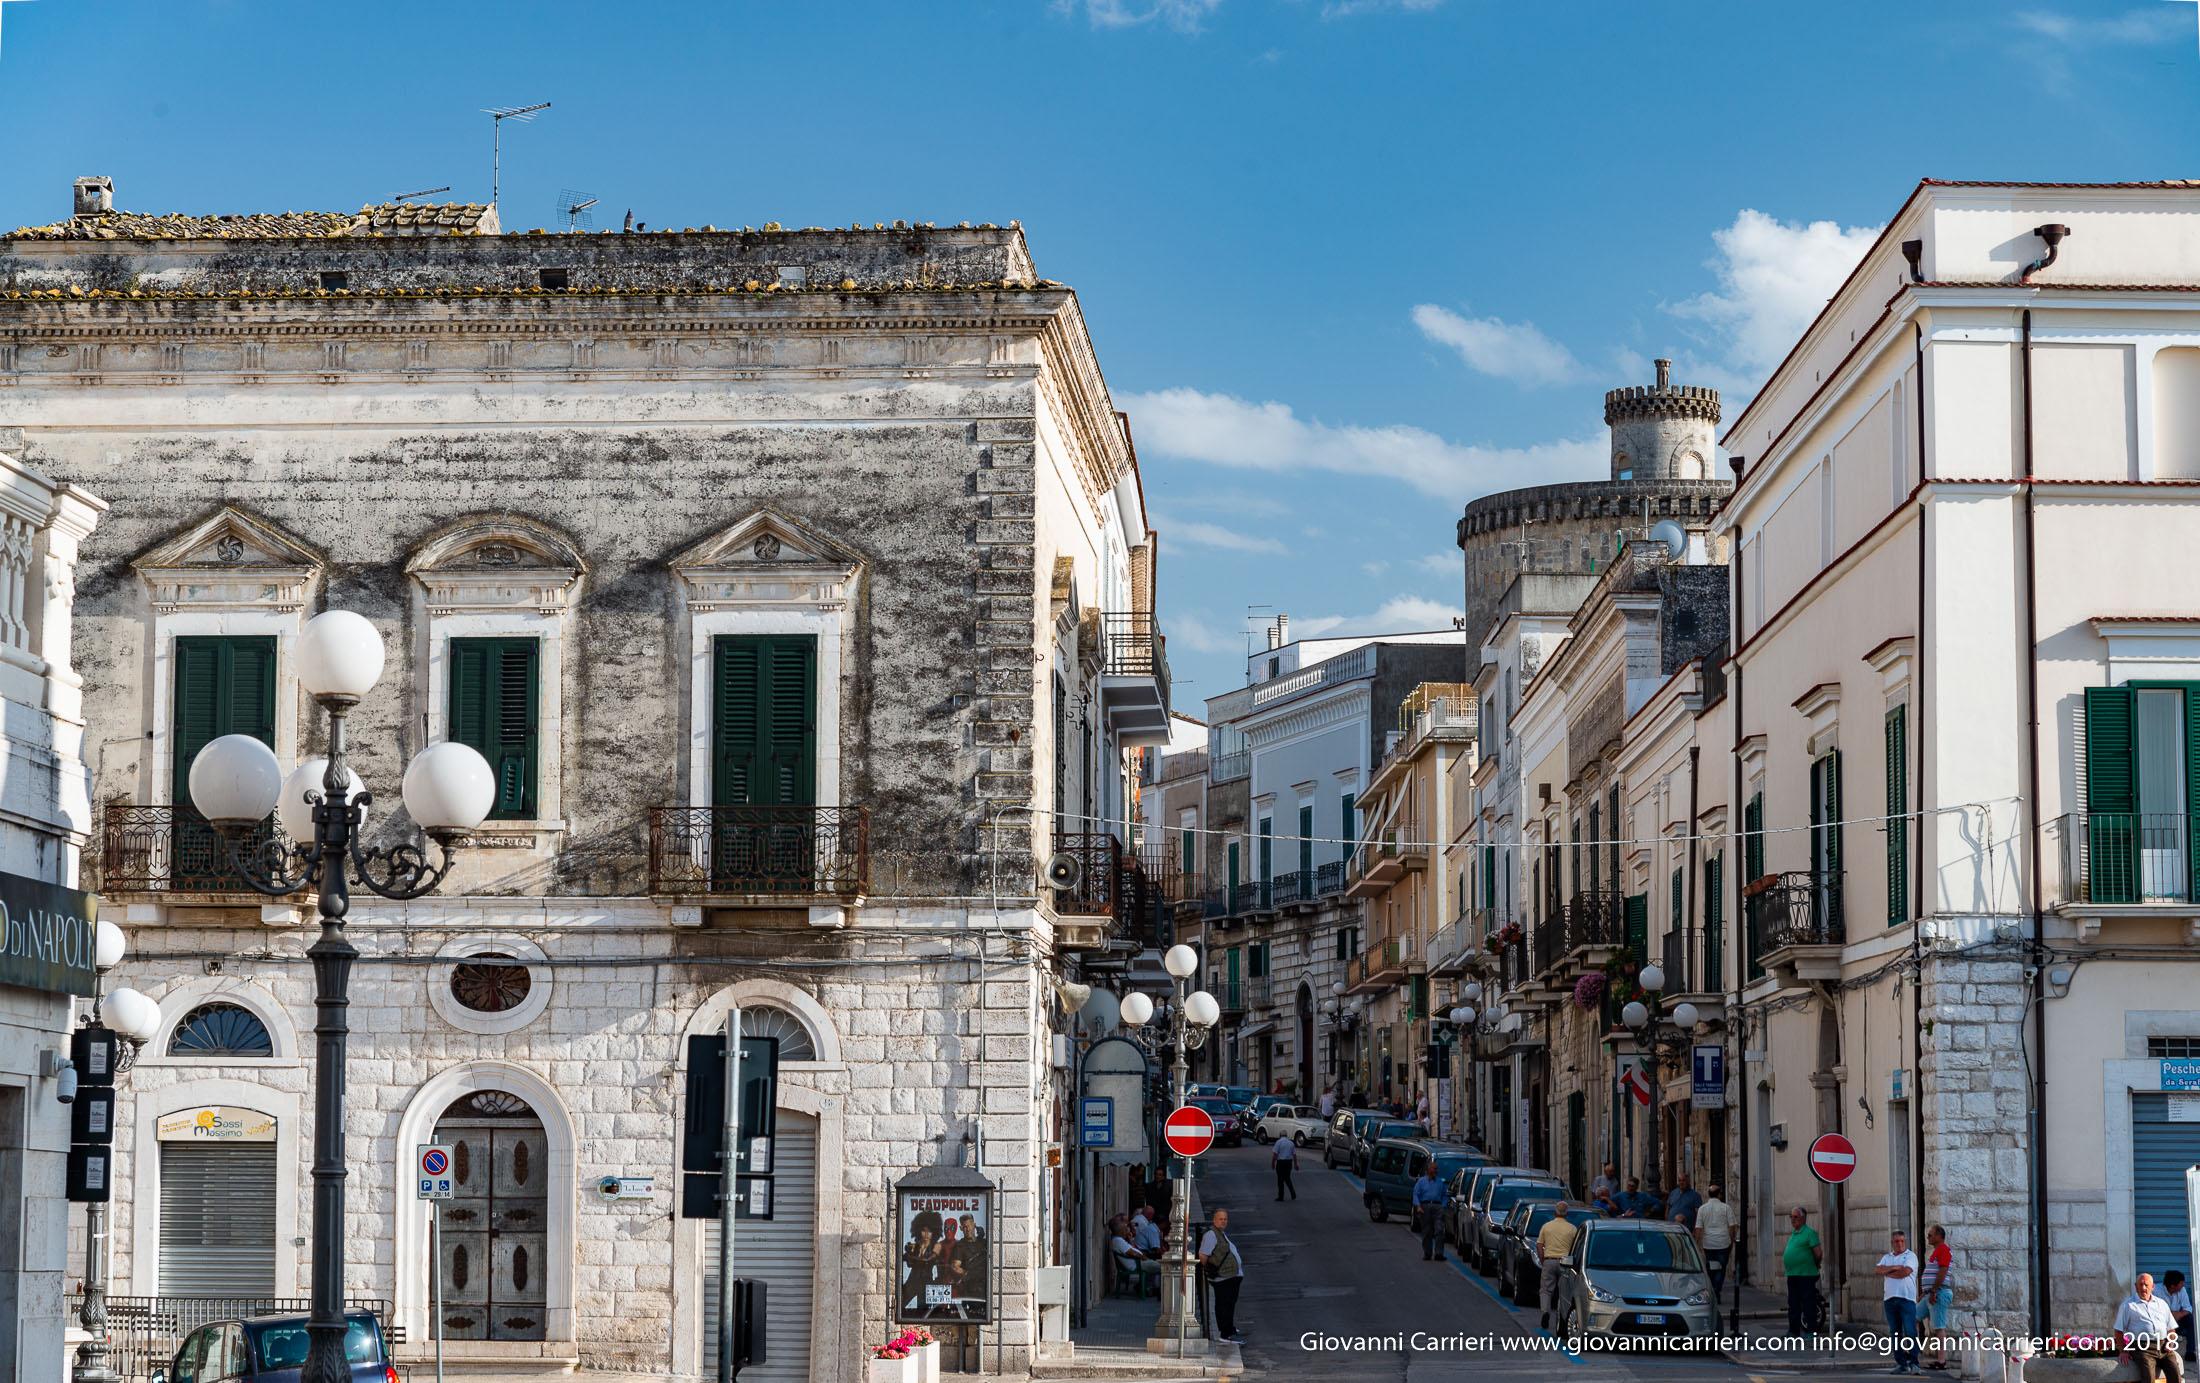 Matteotti street in Minervino Murge